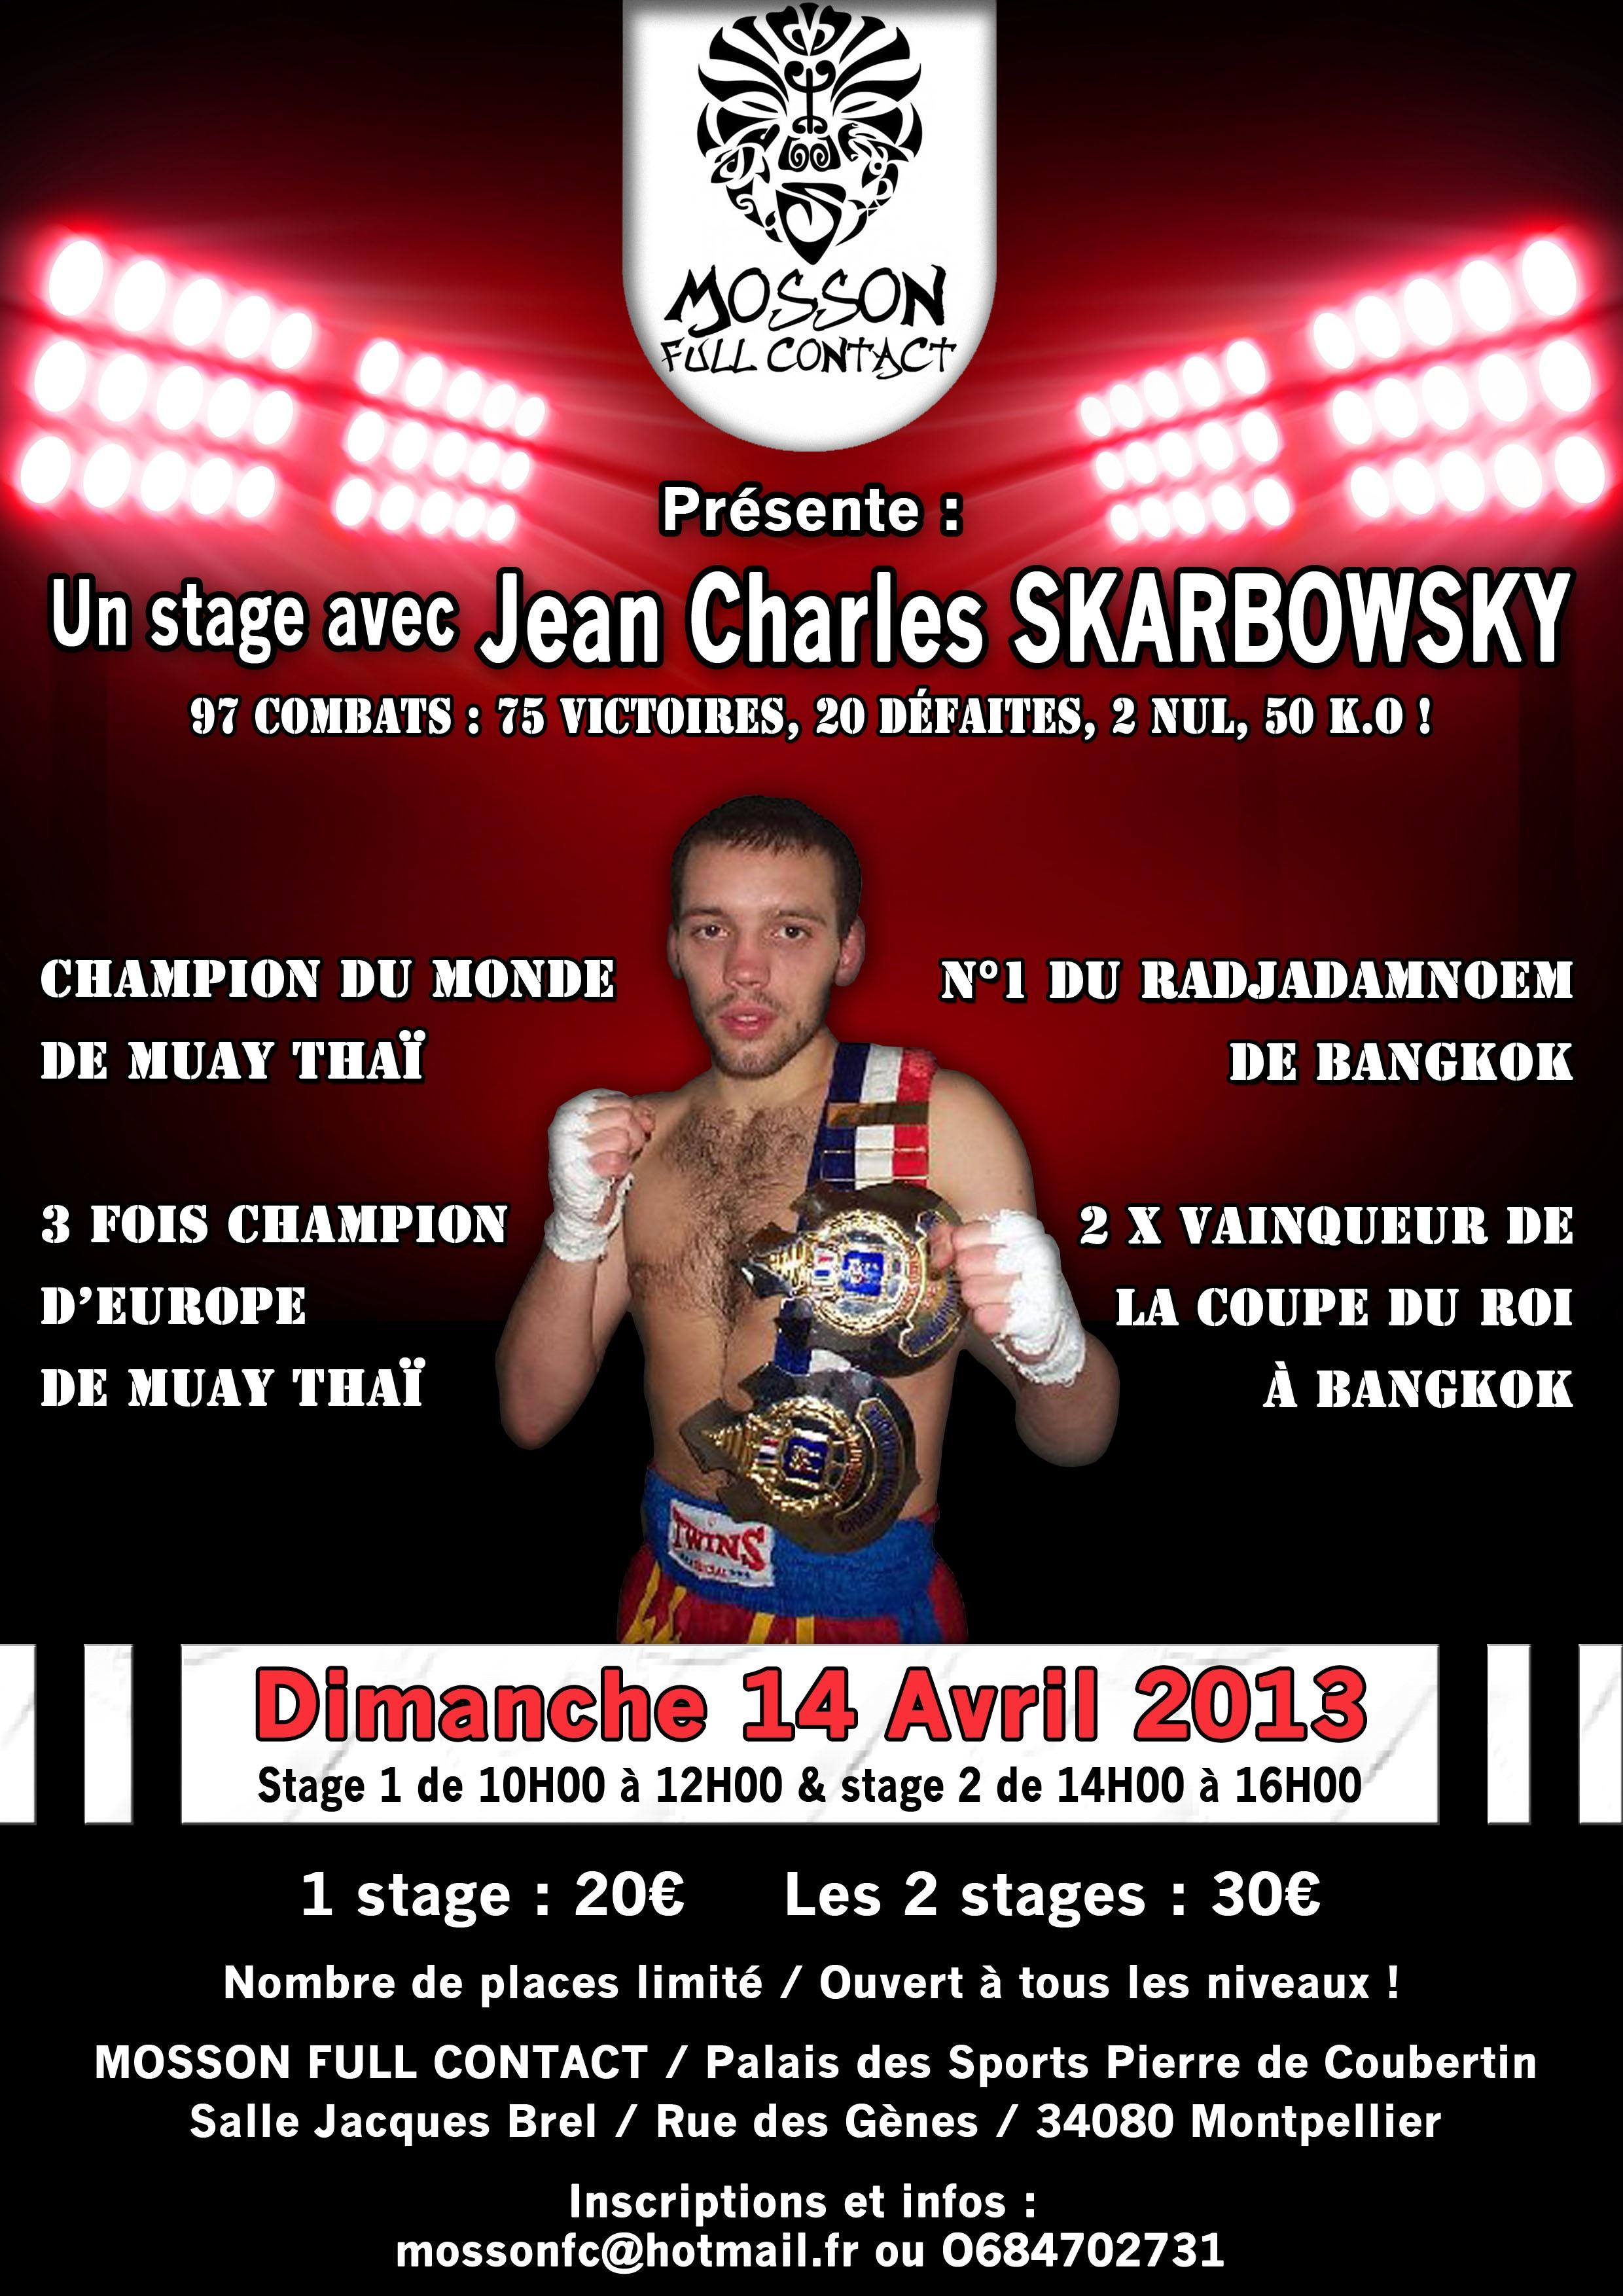 Jean Charles SKARBOWSKY en stage à Montpellier